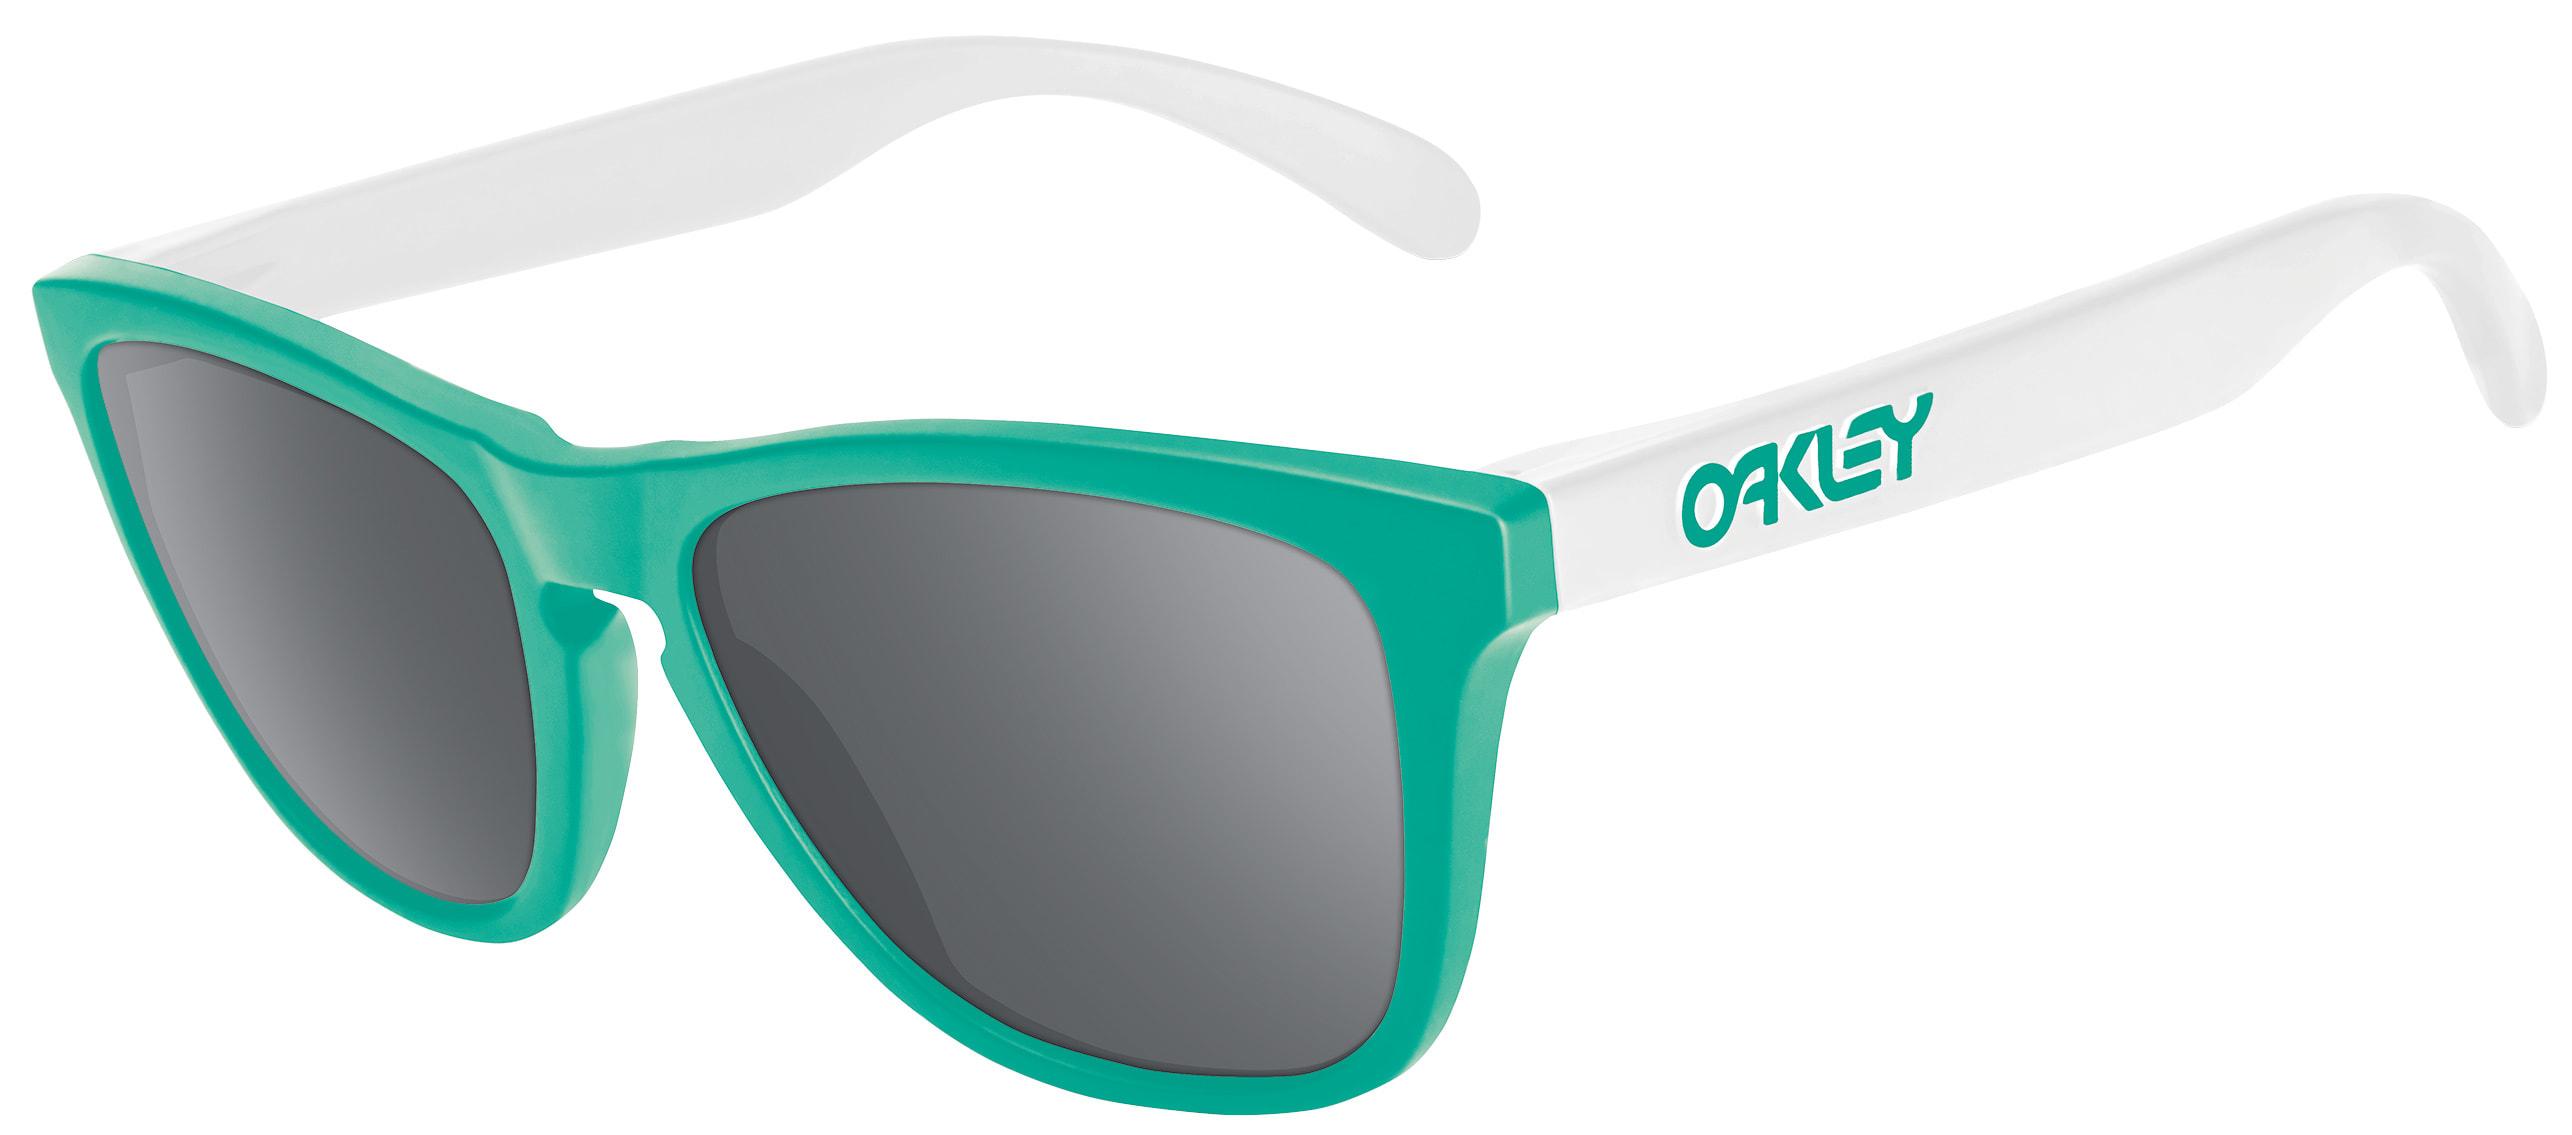 6c1e1010fa9 Oakley Frogskins Legs « One More Soul